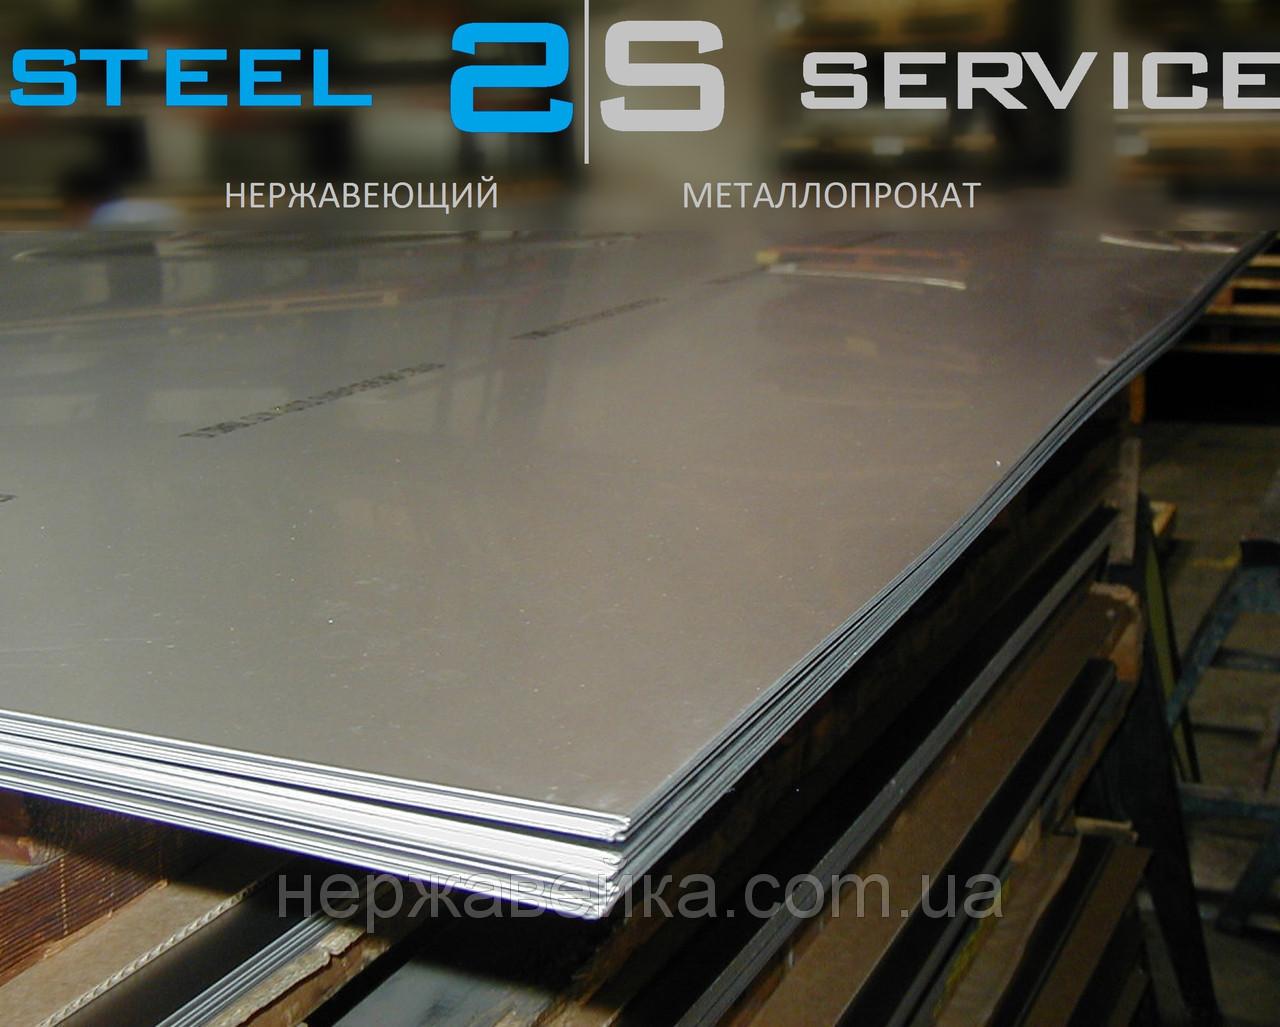 Нержавійка аркуш 1,5х1500х3000мм AISI 430(12Х17) BA - дзеркало, технічний